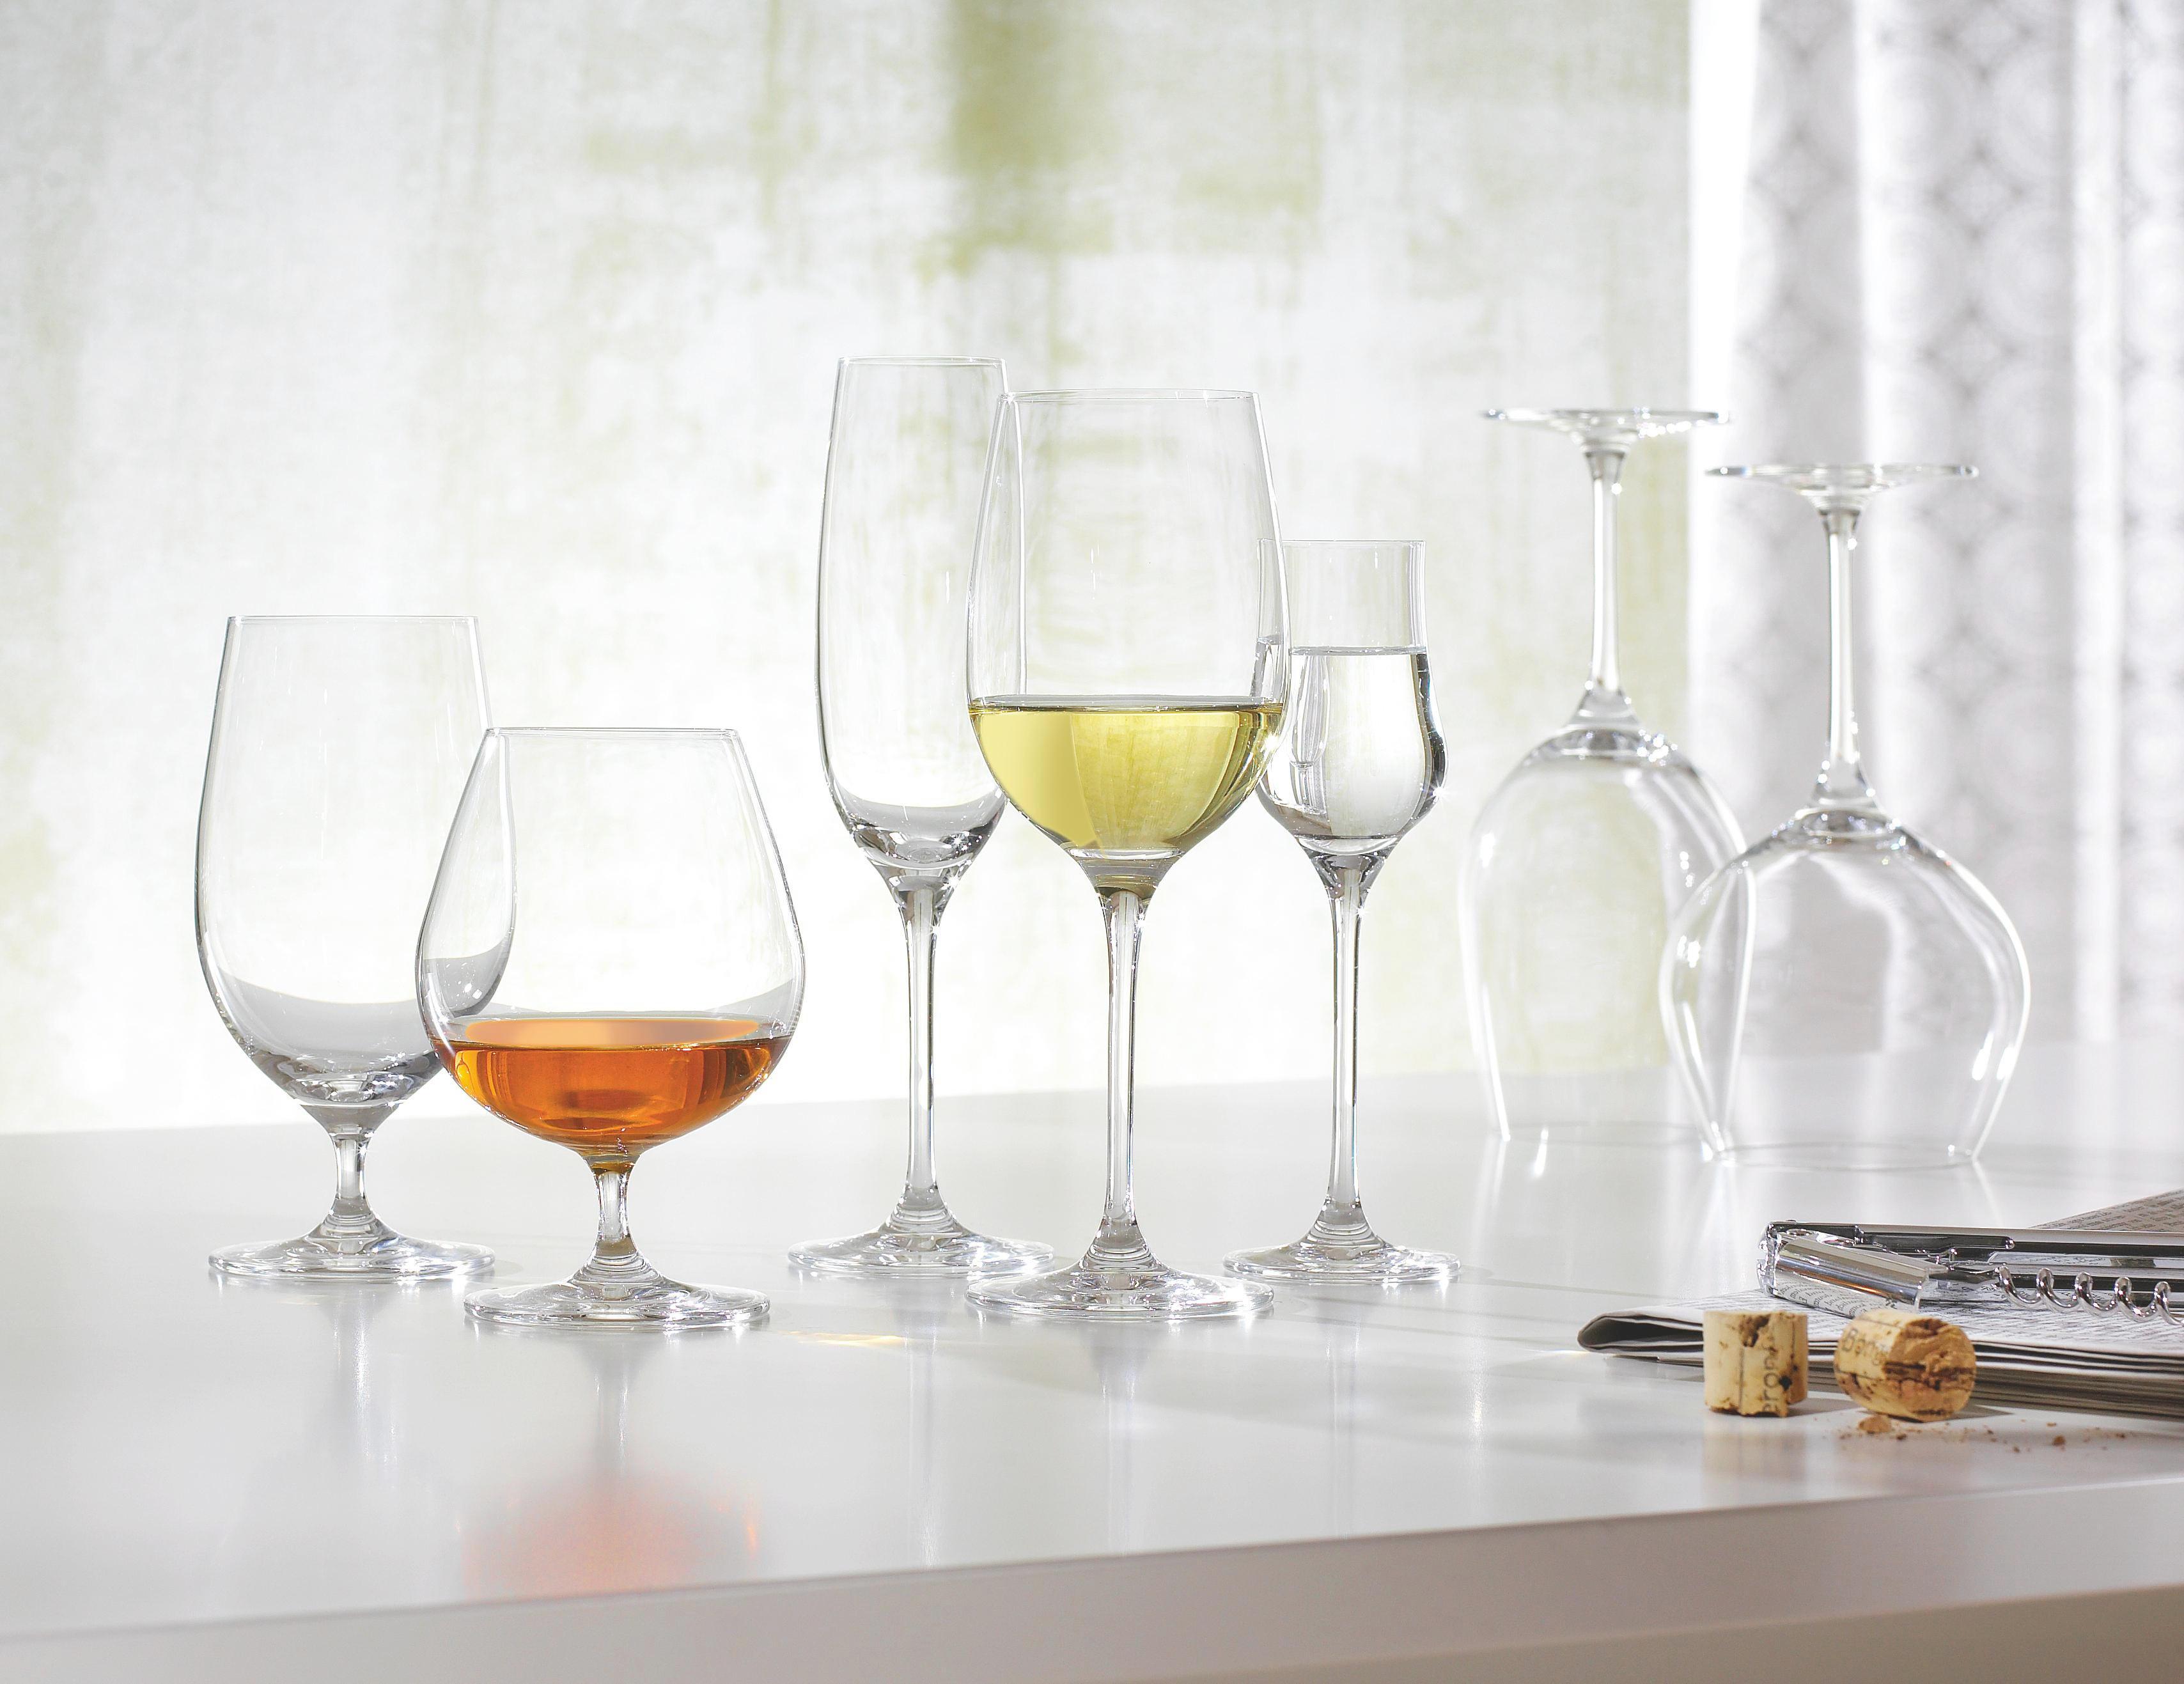 KOZAREC ZA VODO CIAO+ - prozorna, Konvencionalno, steklo (7.5/13cm) - LEONARDO